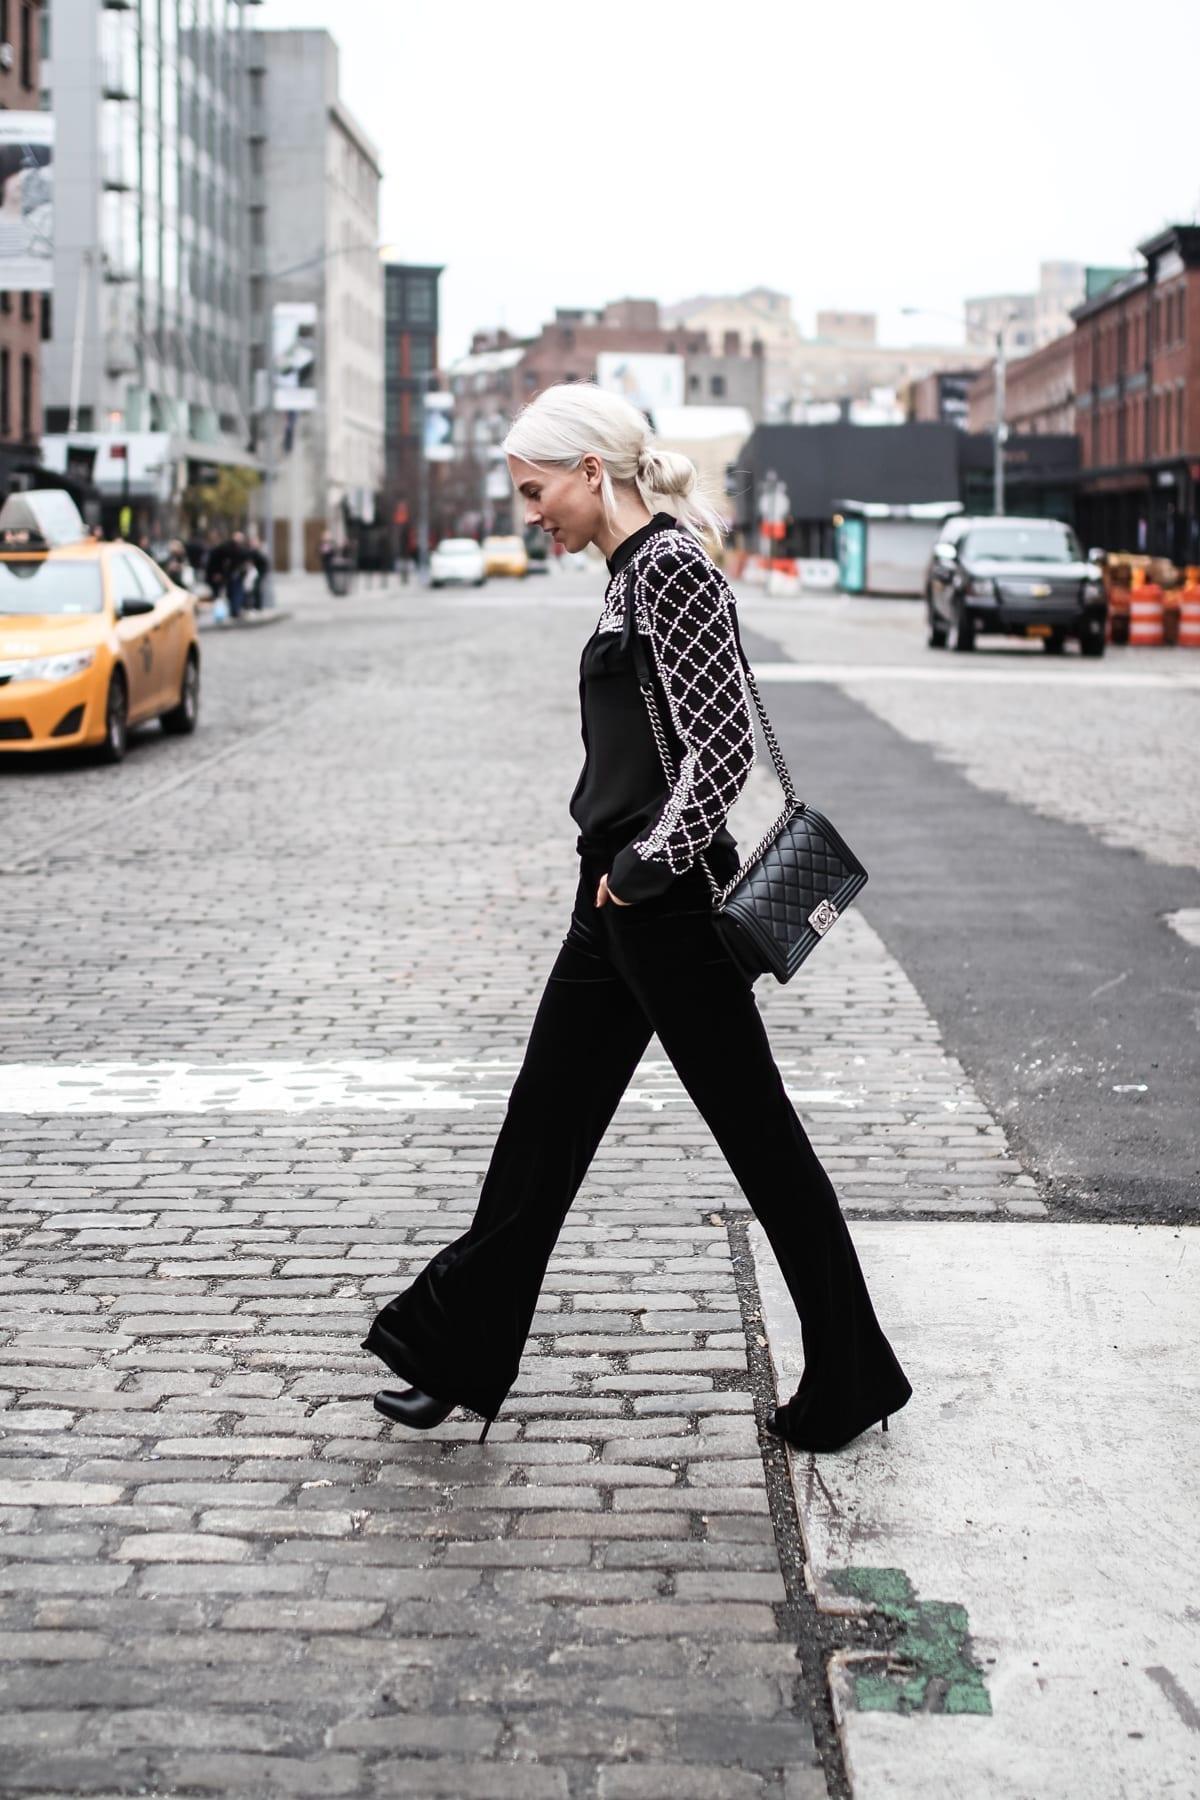 CK_1603_constantlyk_new-york-travel-fashion-blog-4941